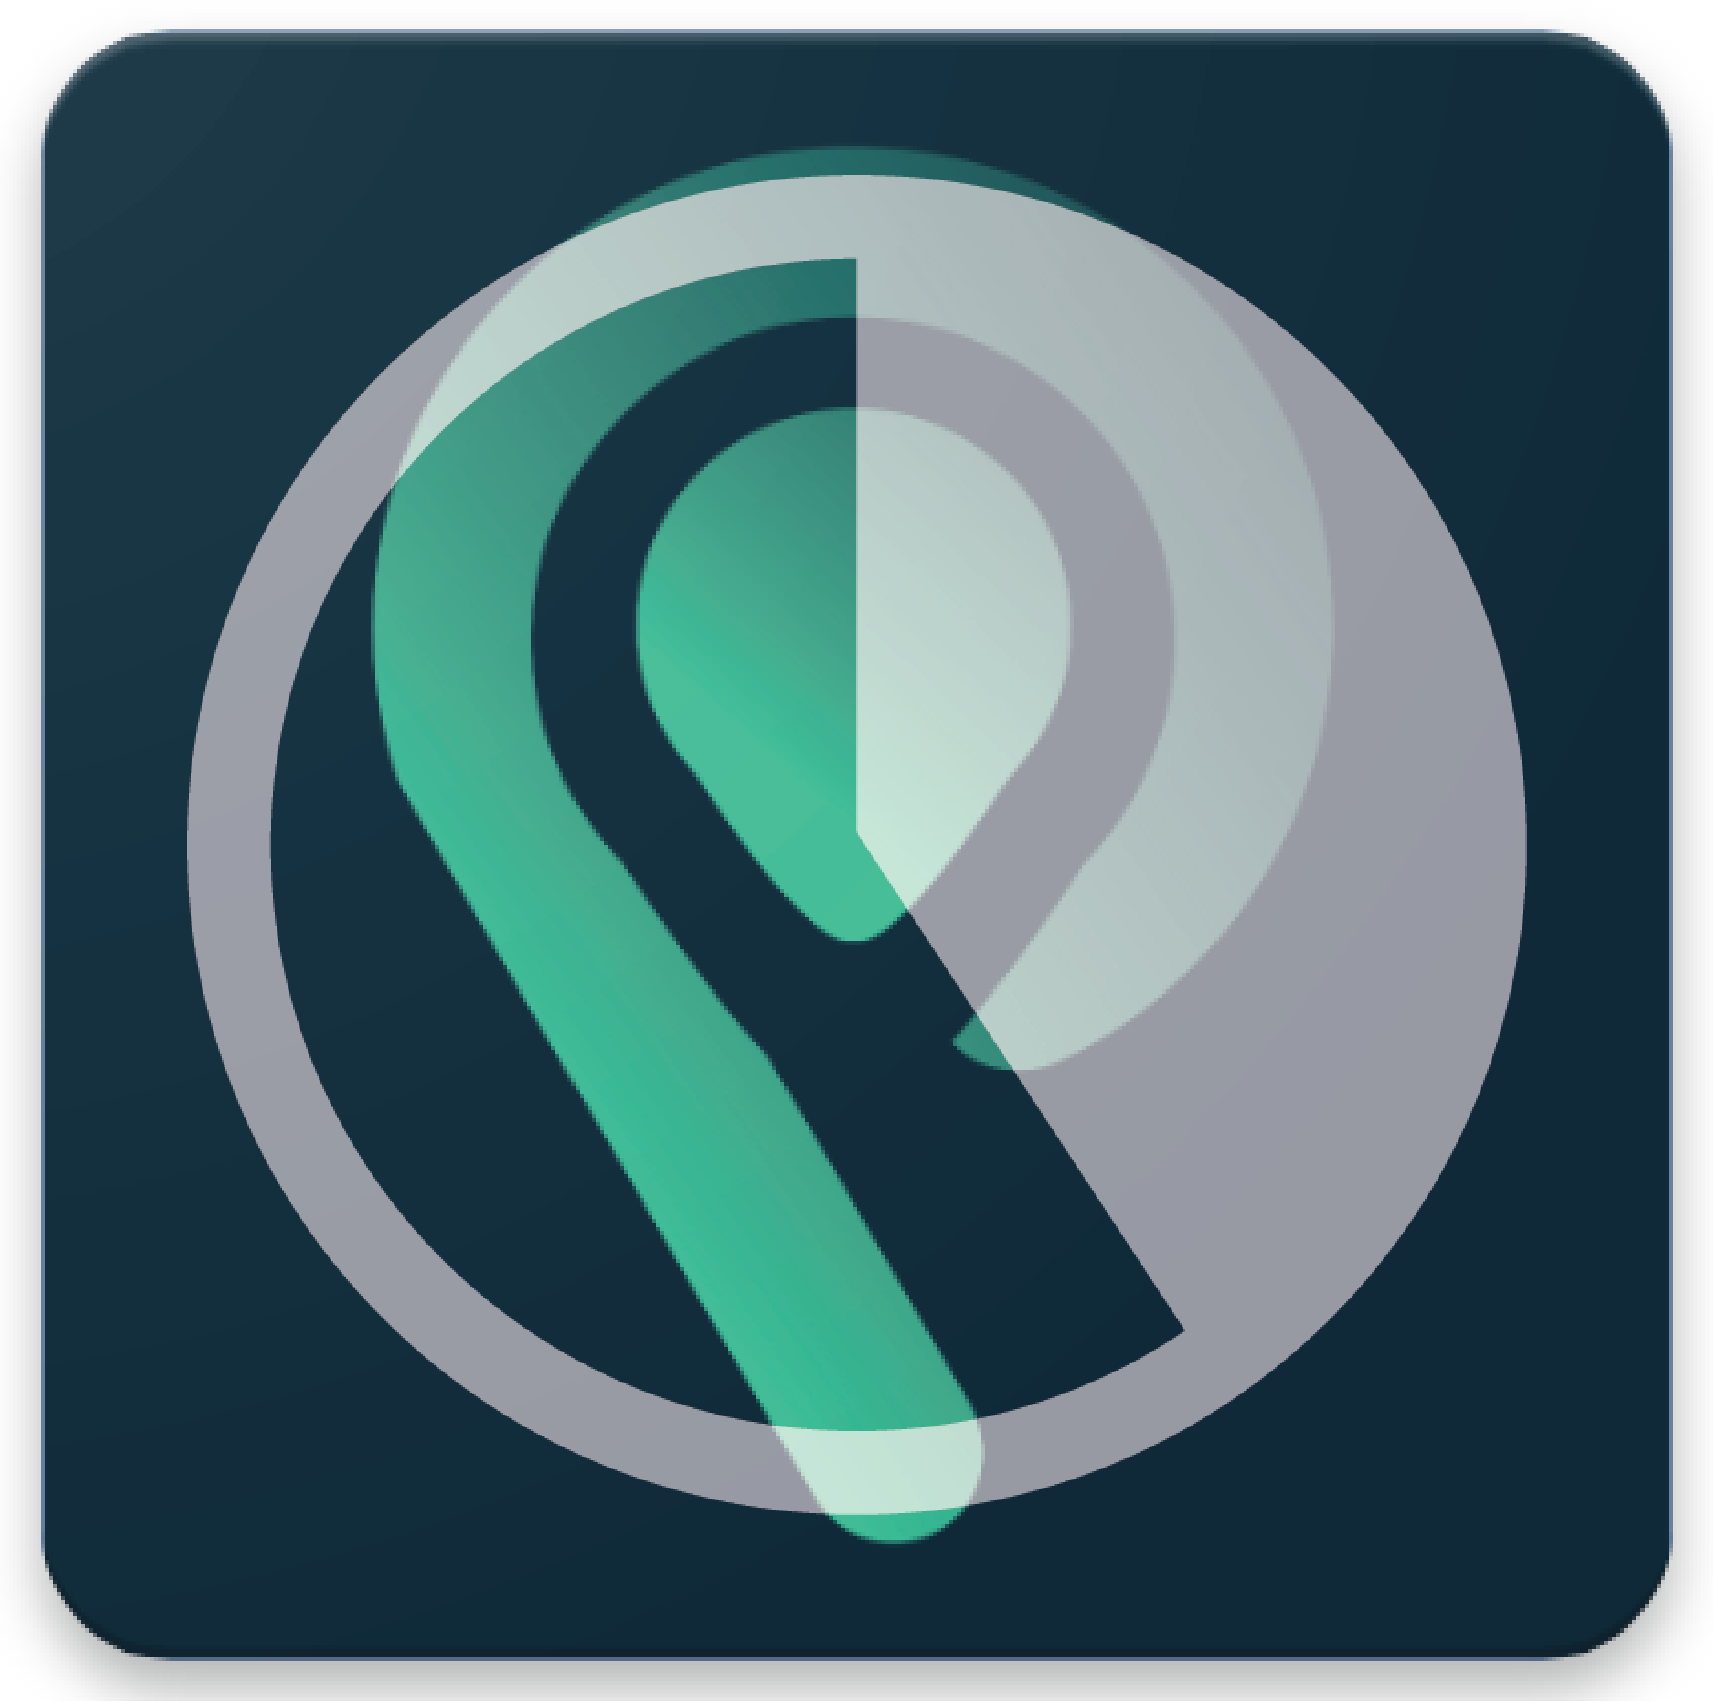 Download ParkStash app